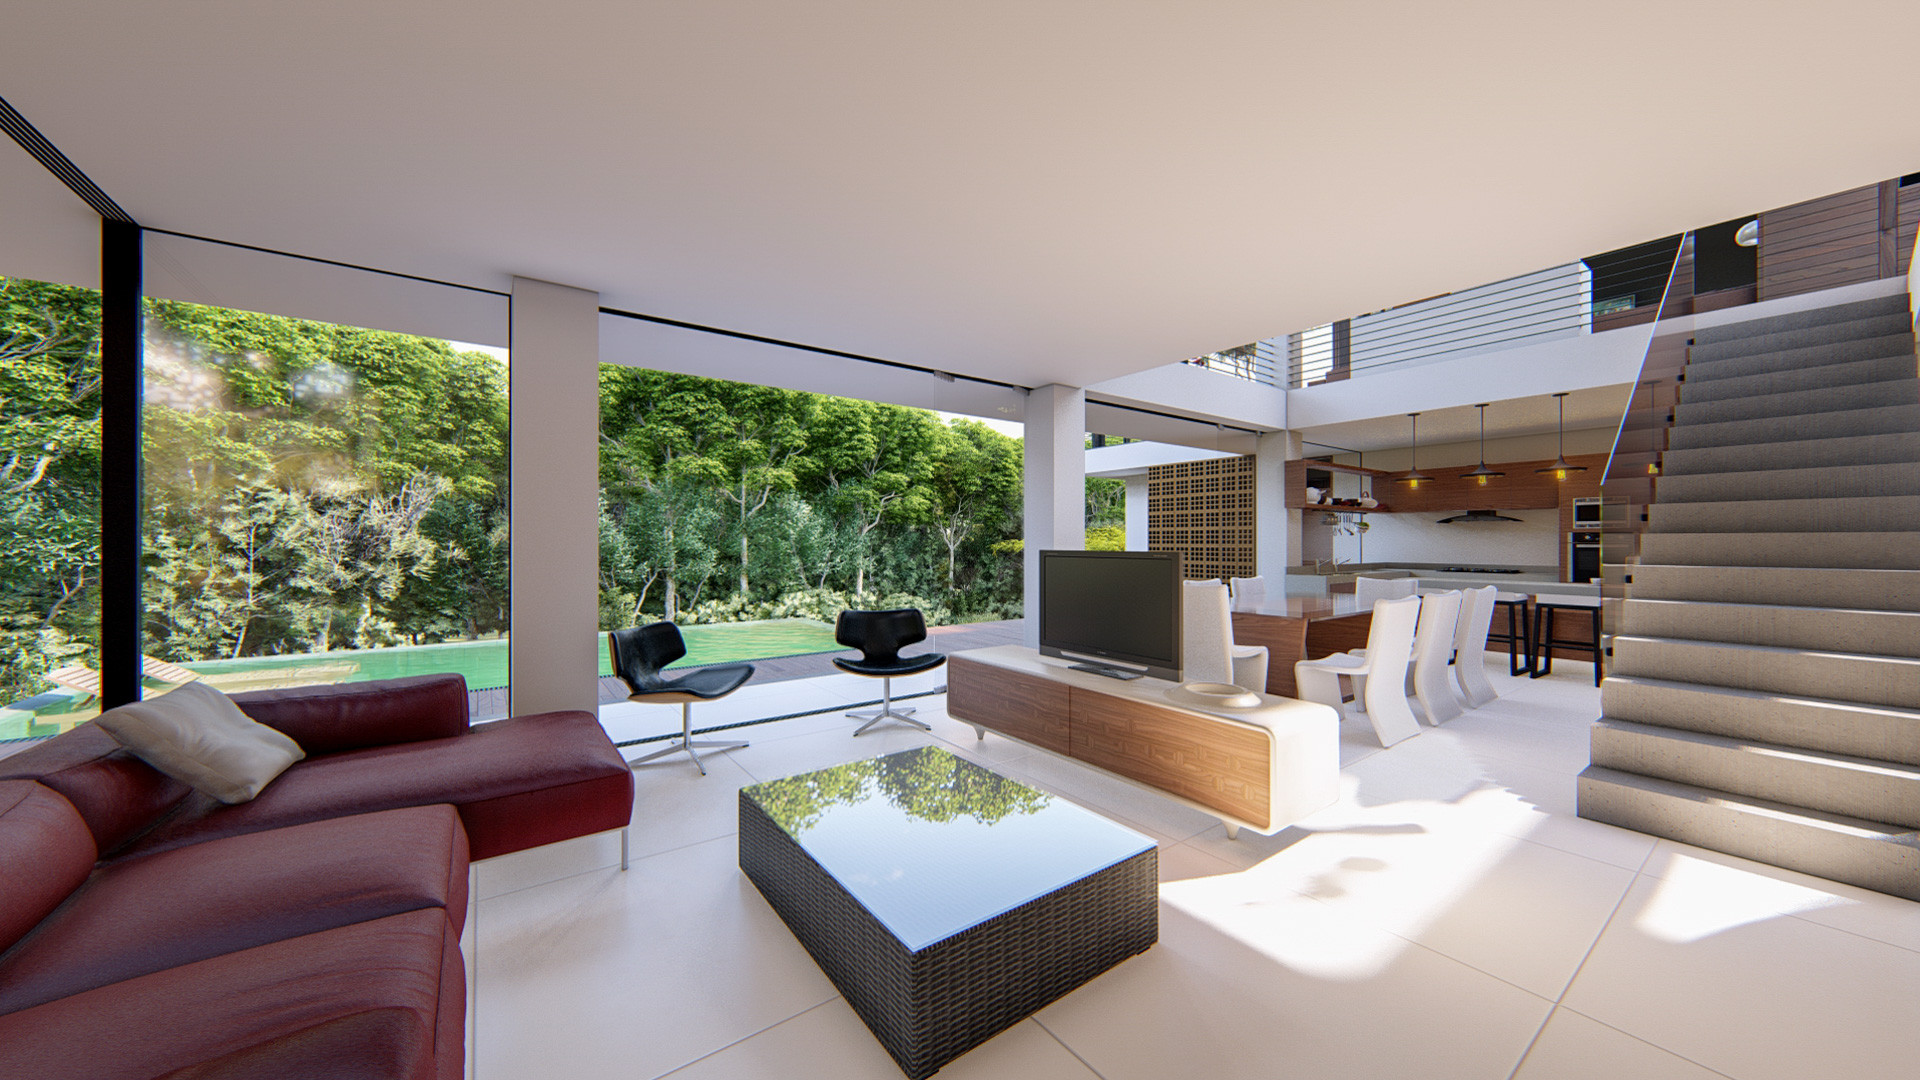 numen arquitetura - casa du charme (16).